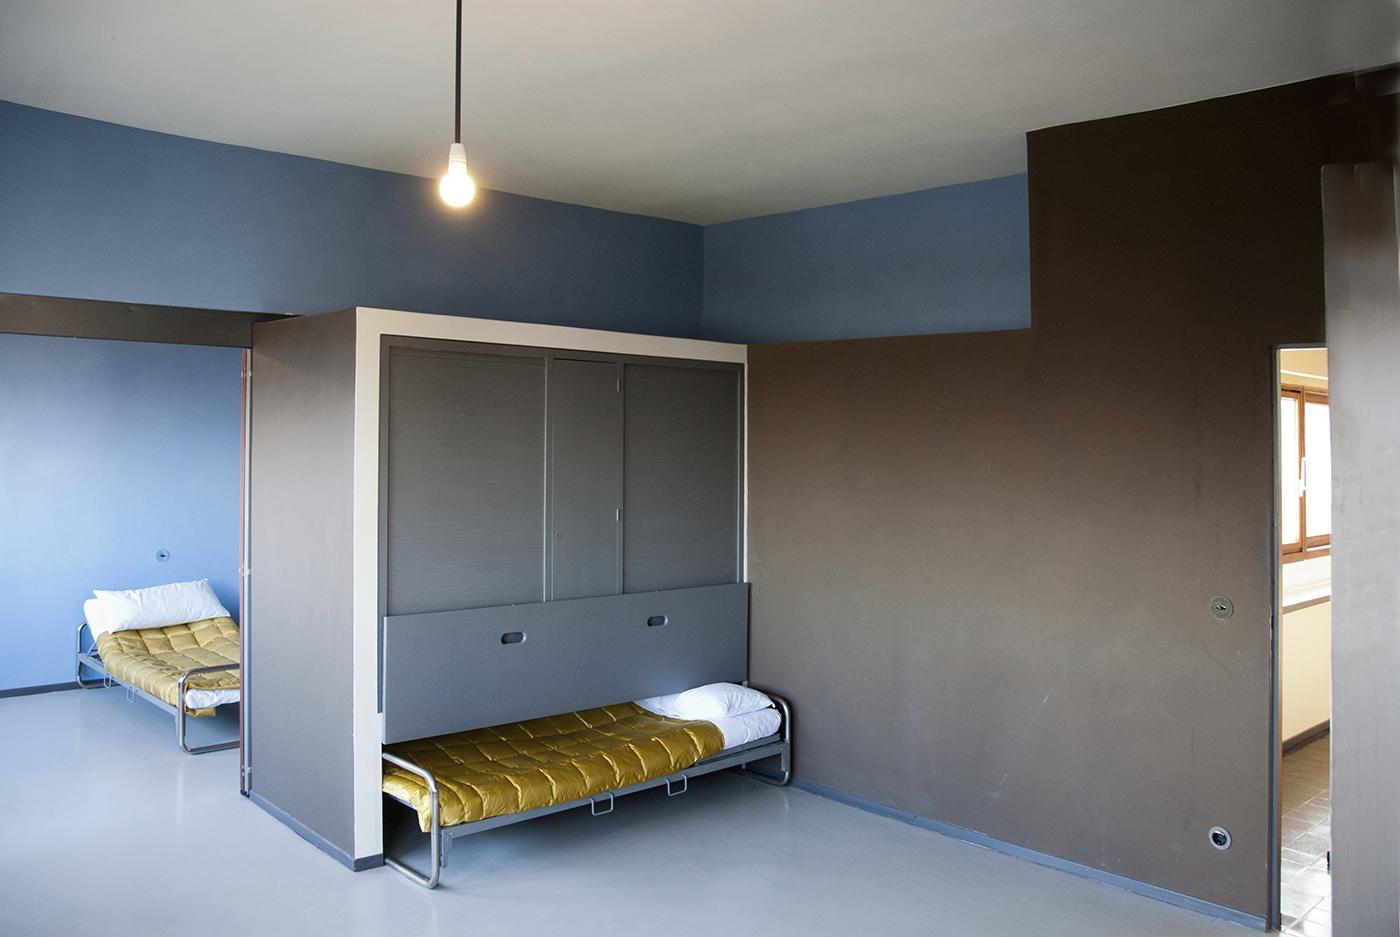 corbu innen markus caspers. Black Bedroom Furniture Sets. Home Design Ideas